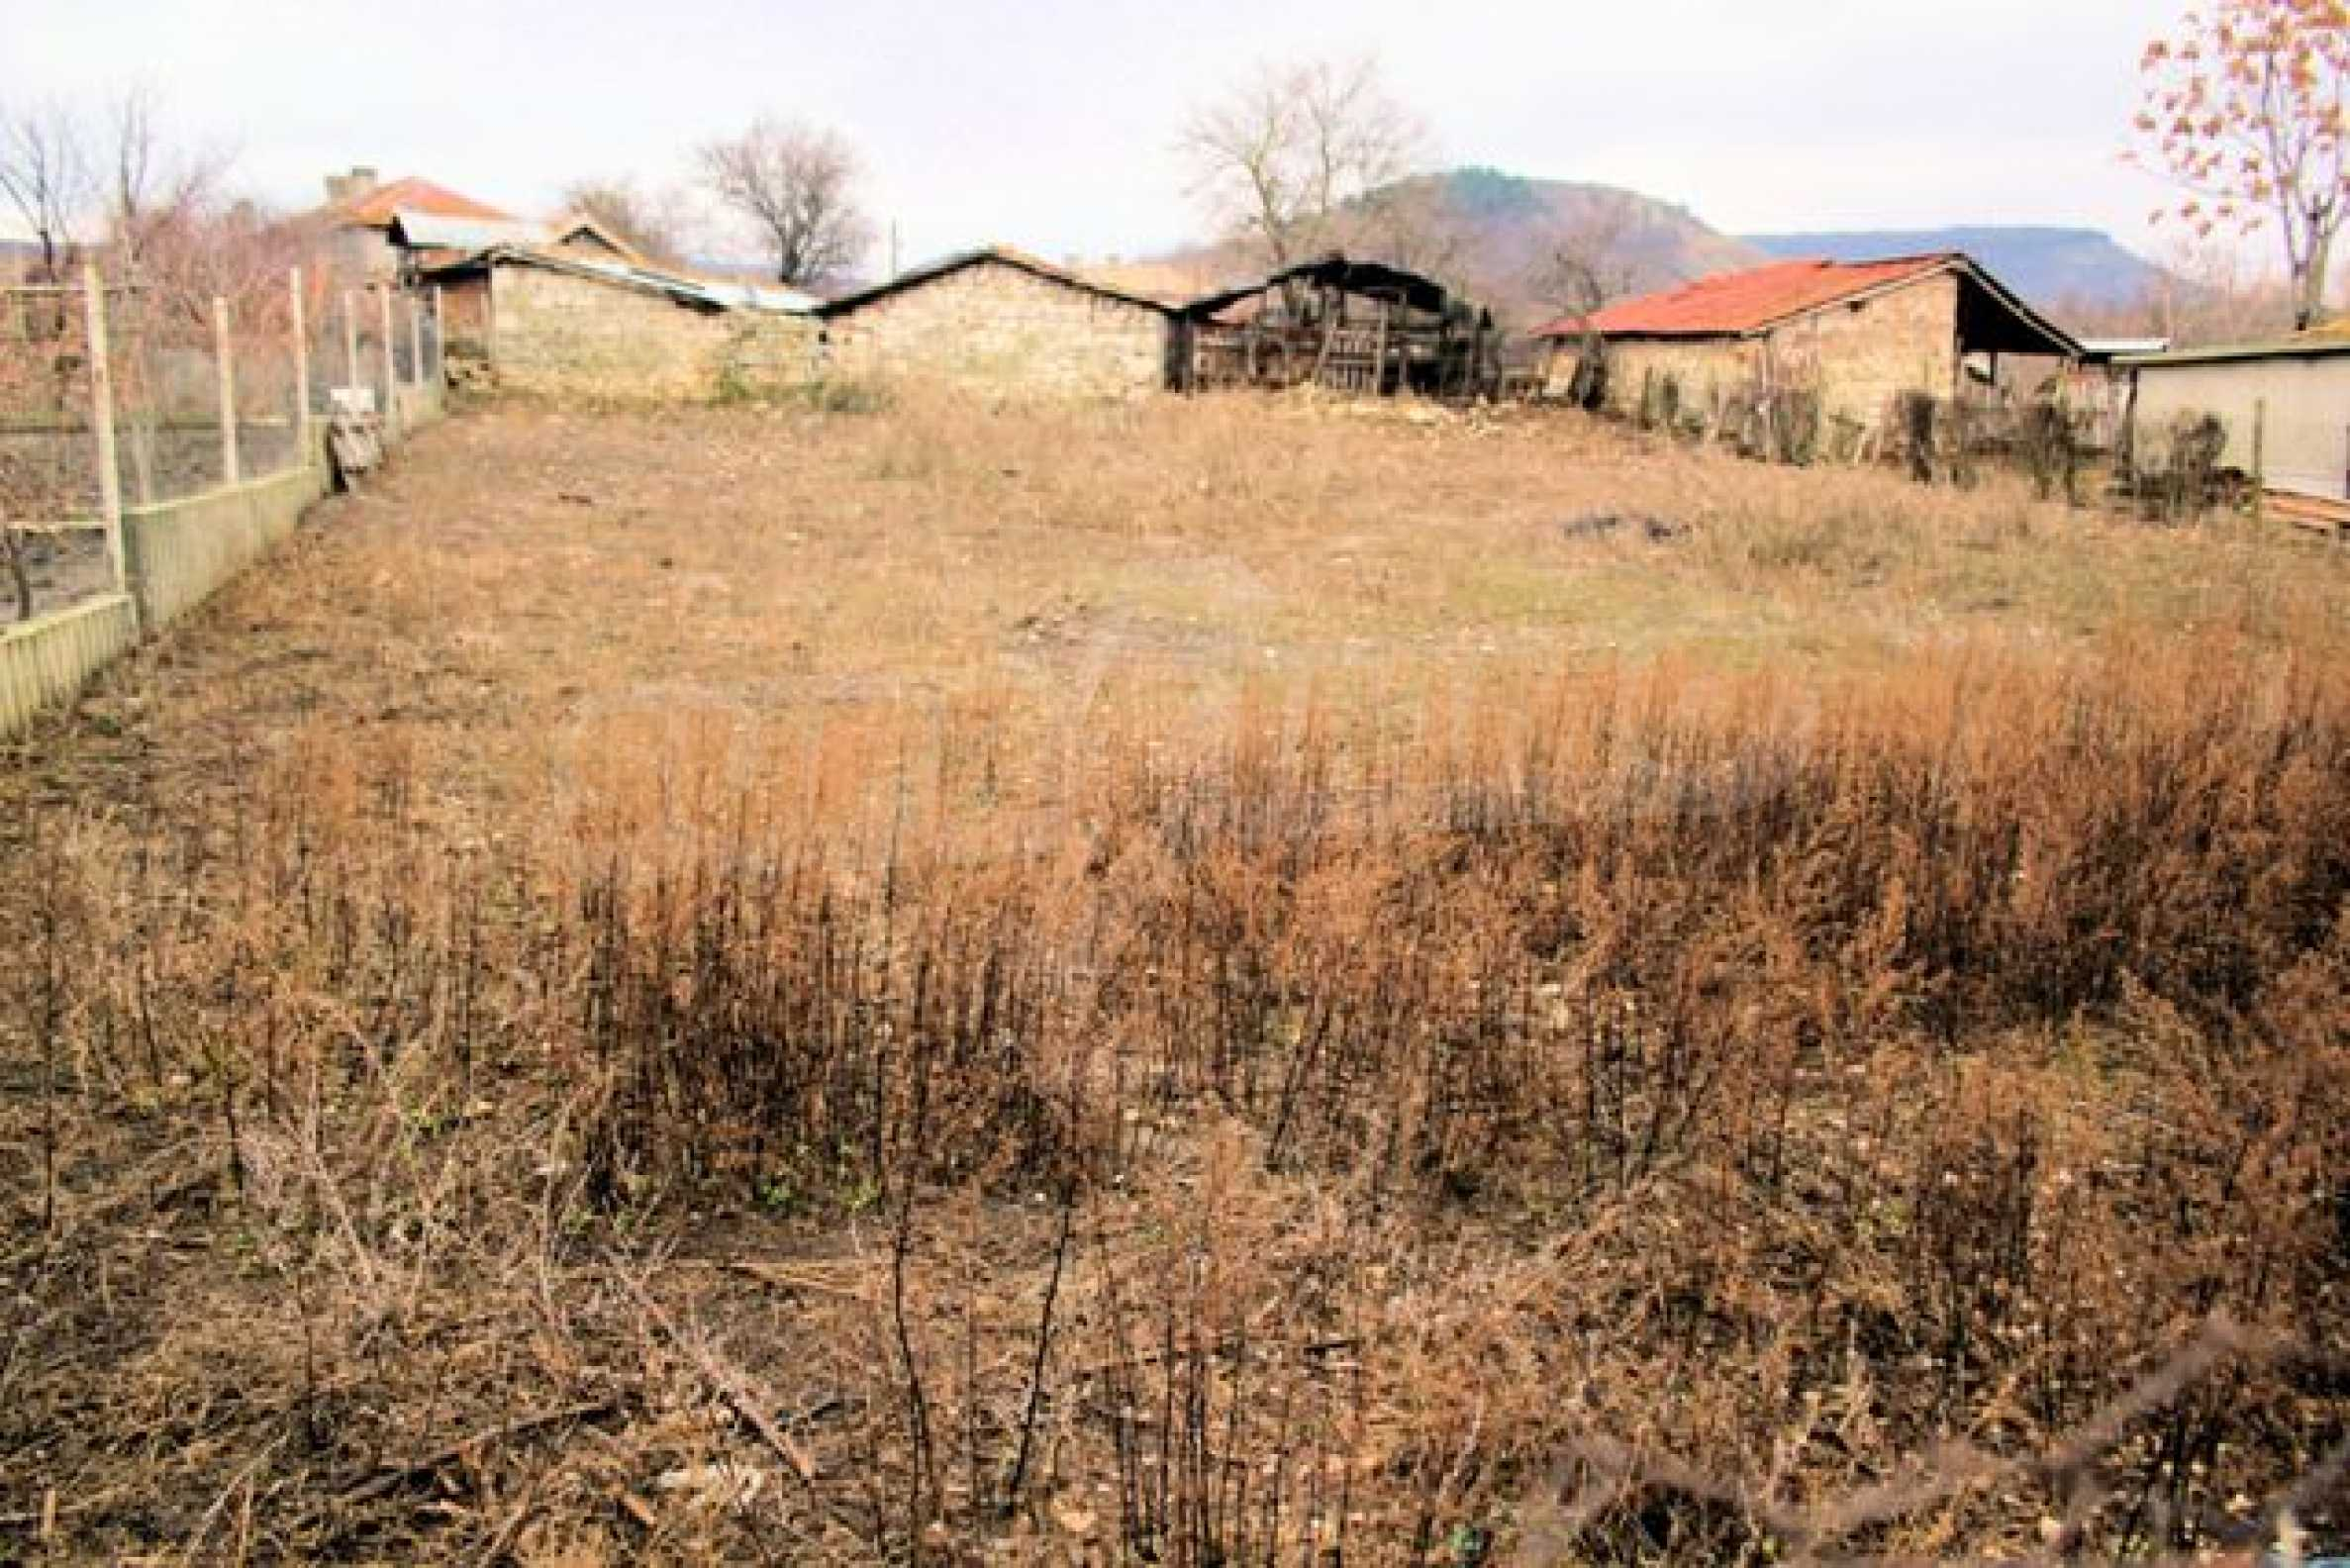 Village plot for sale near Suvorovo